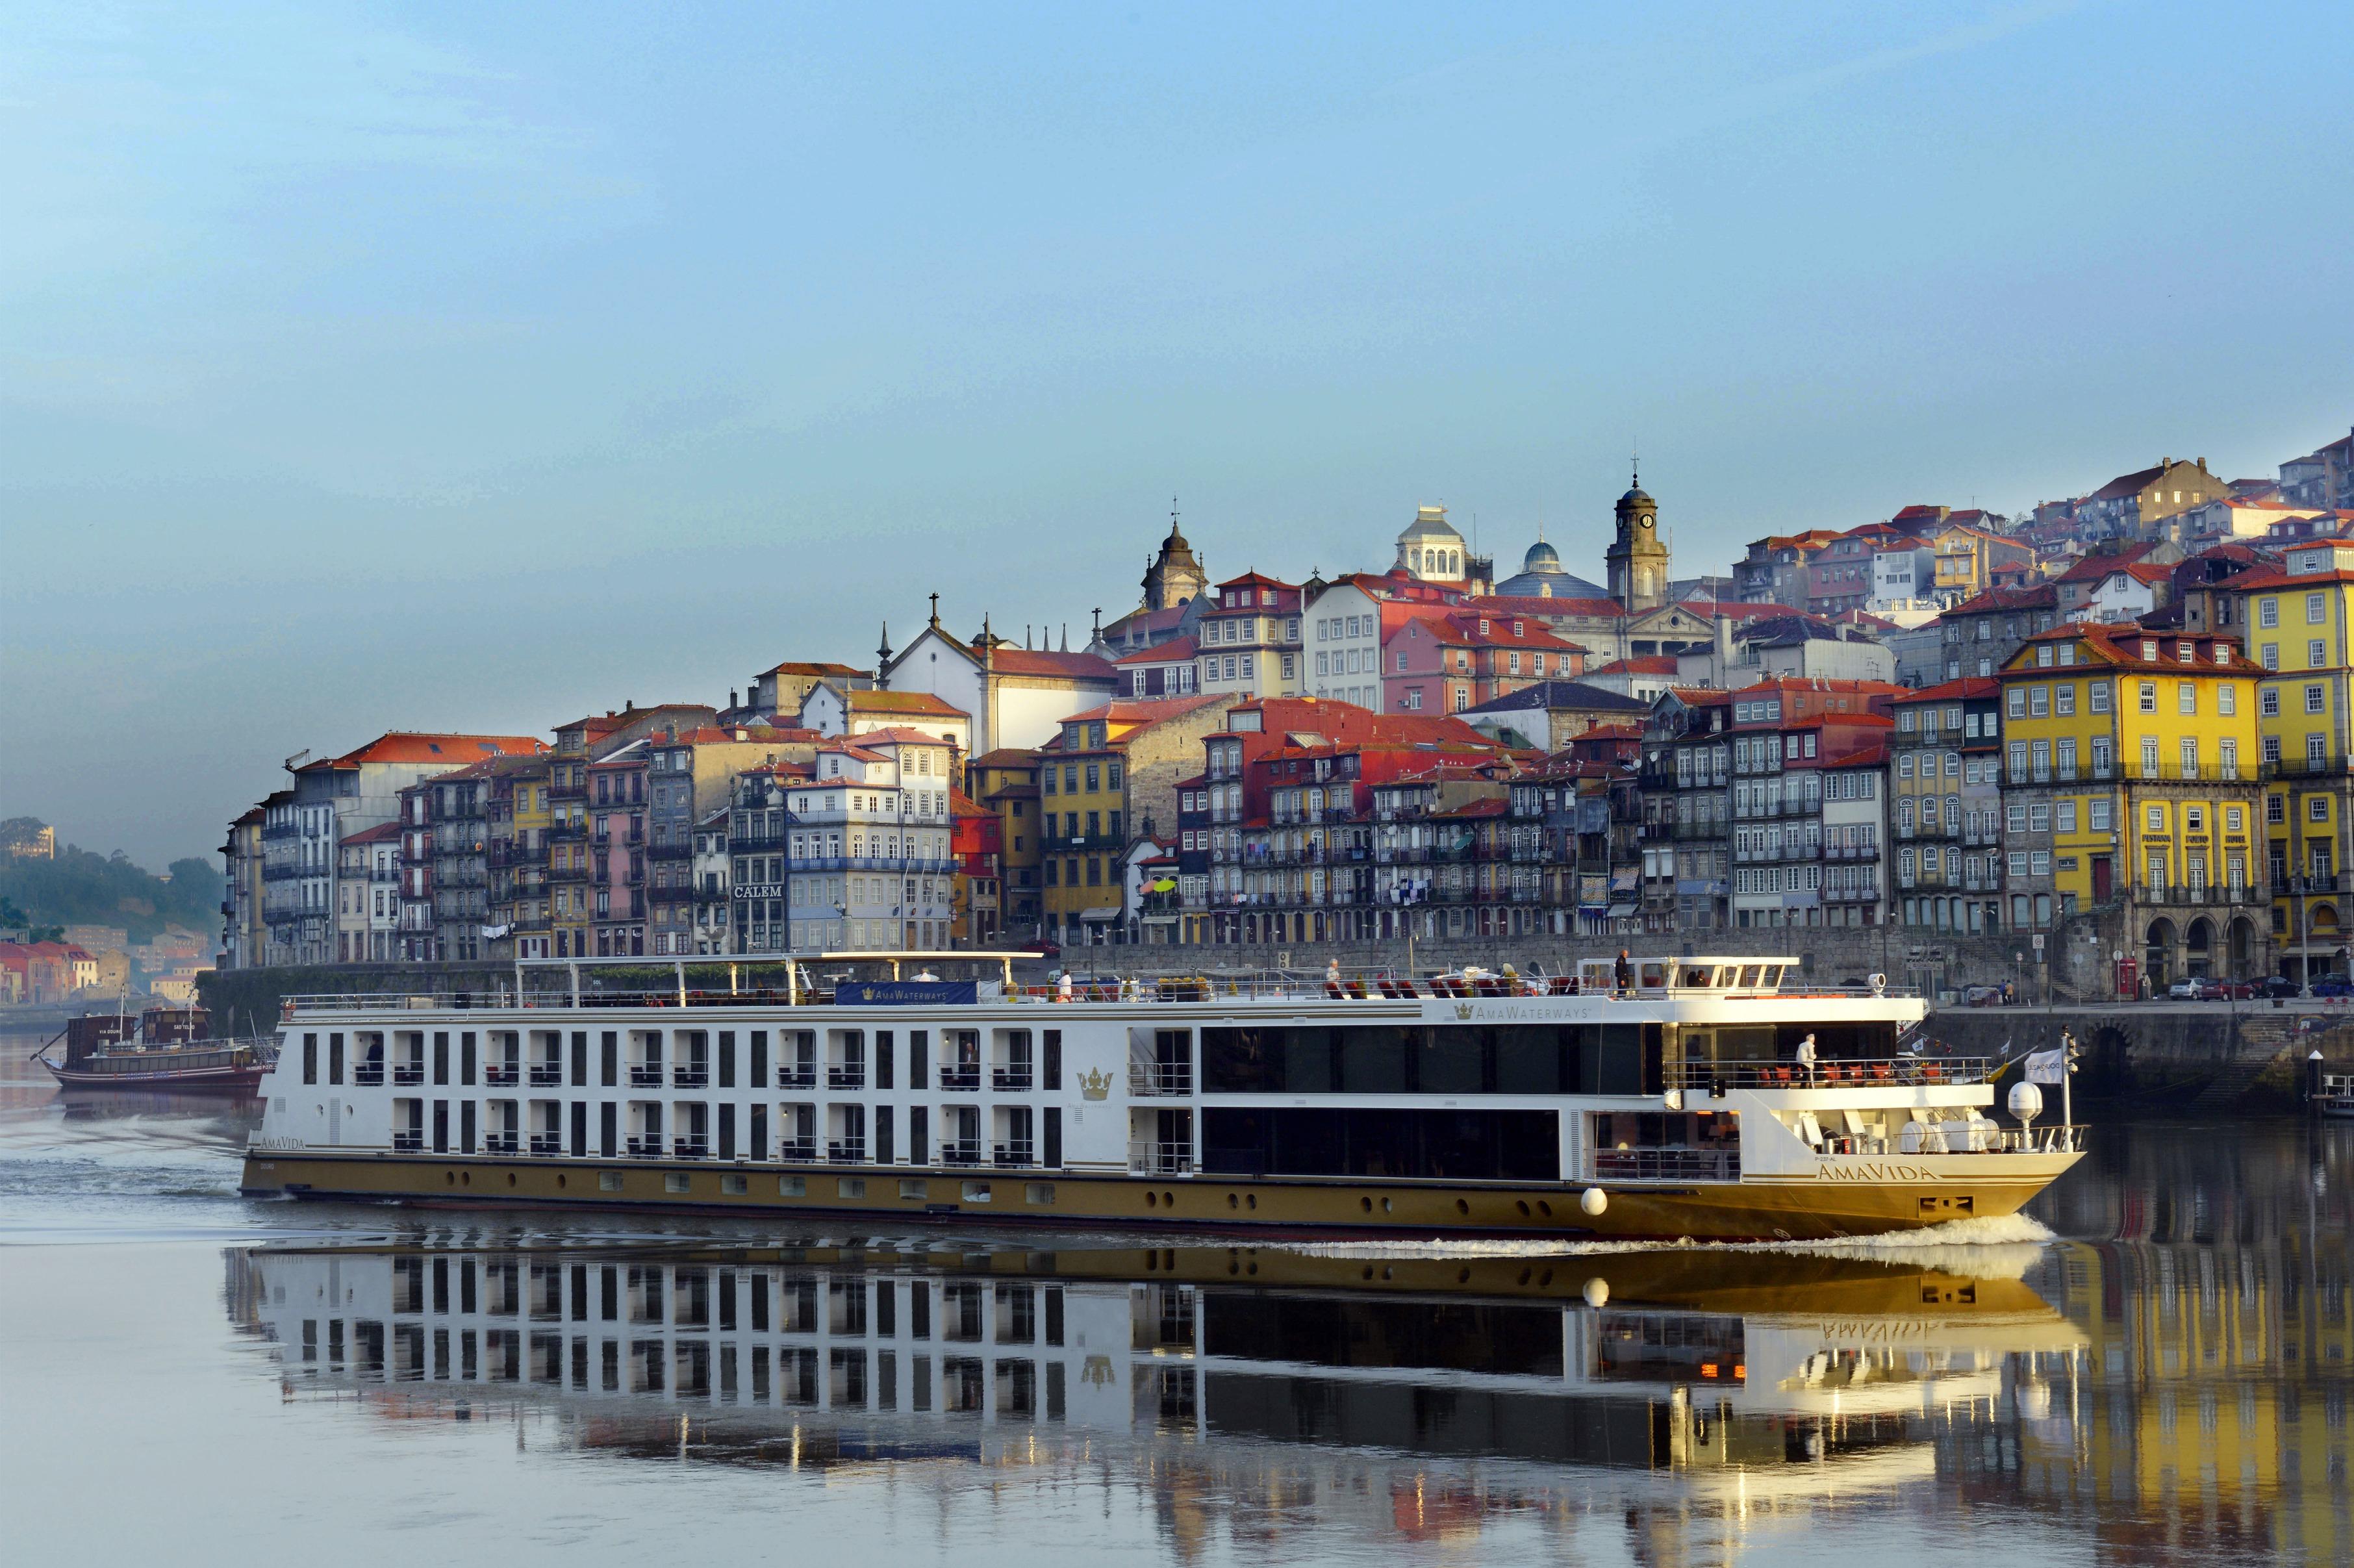 AmaVida on the Douro river, Porto